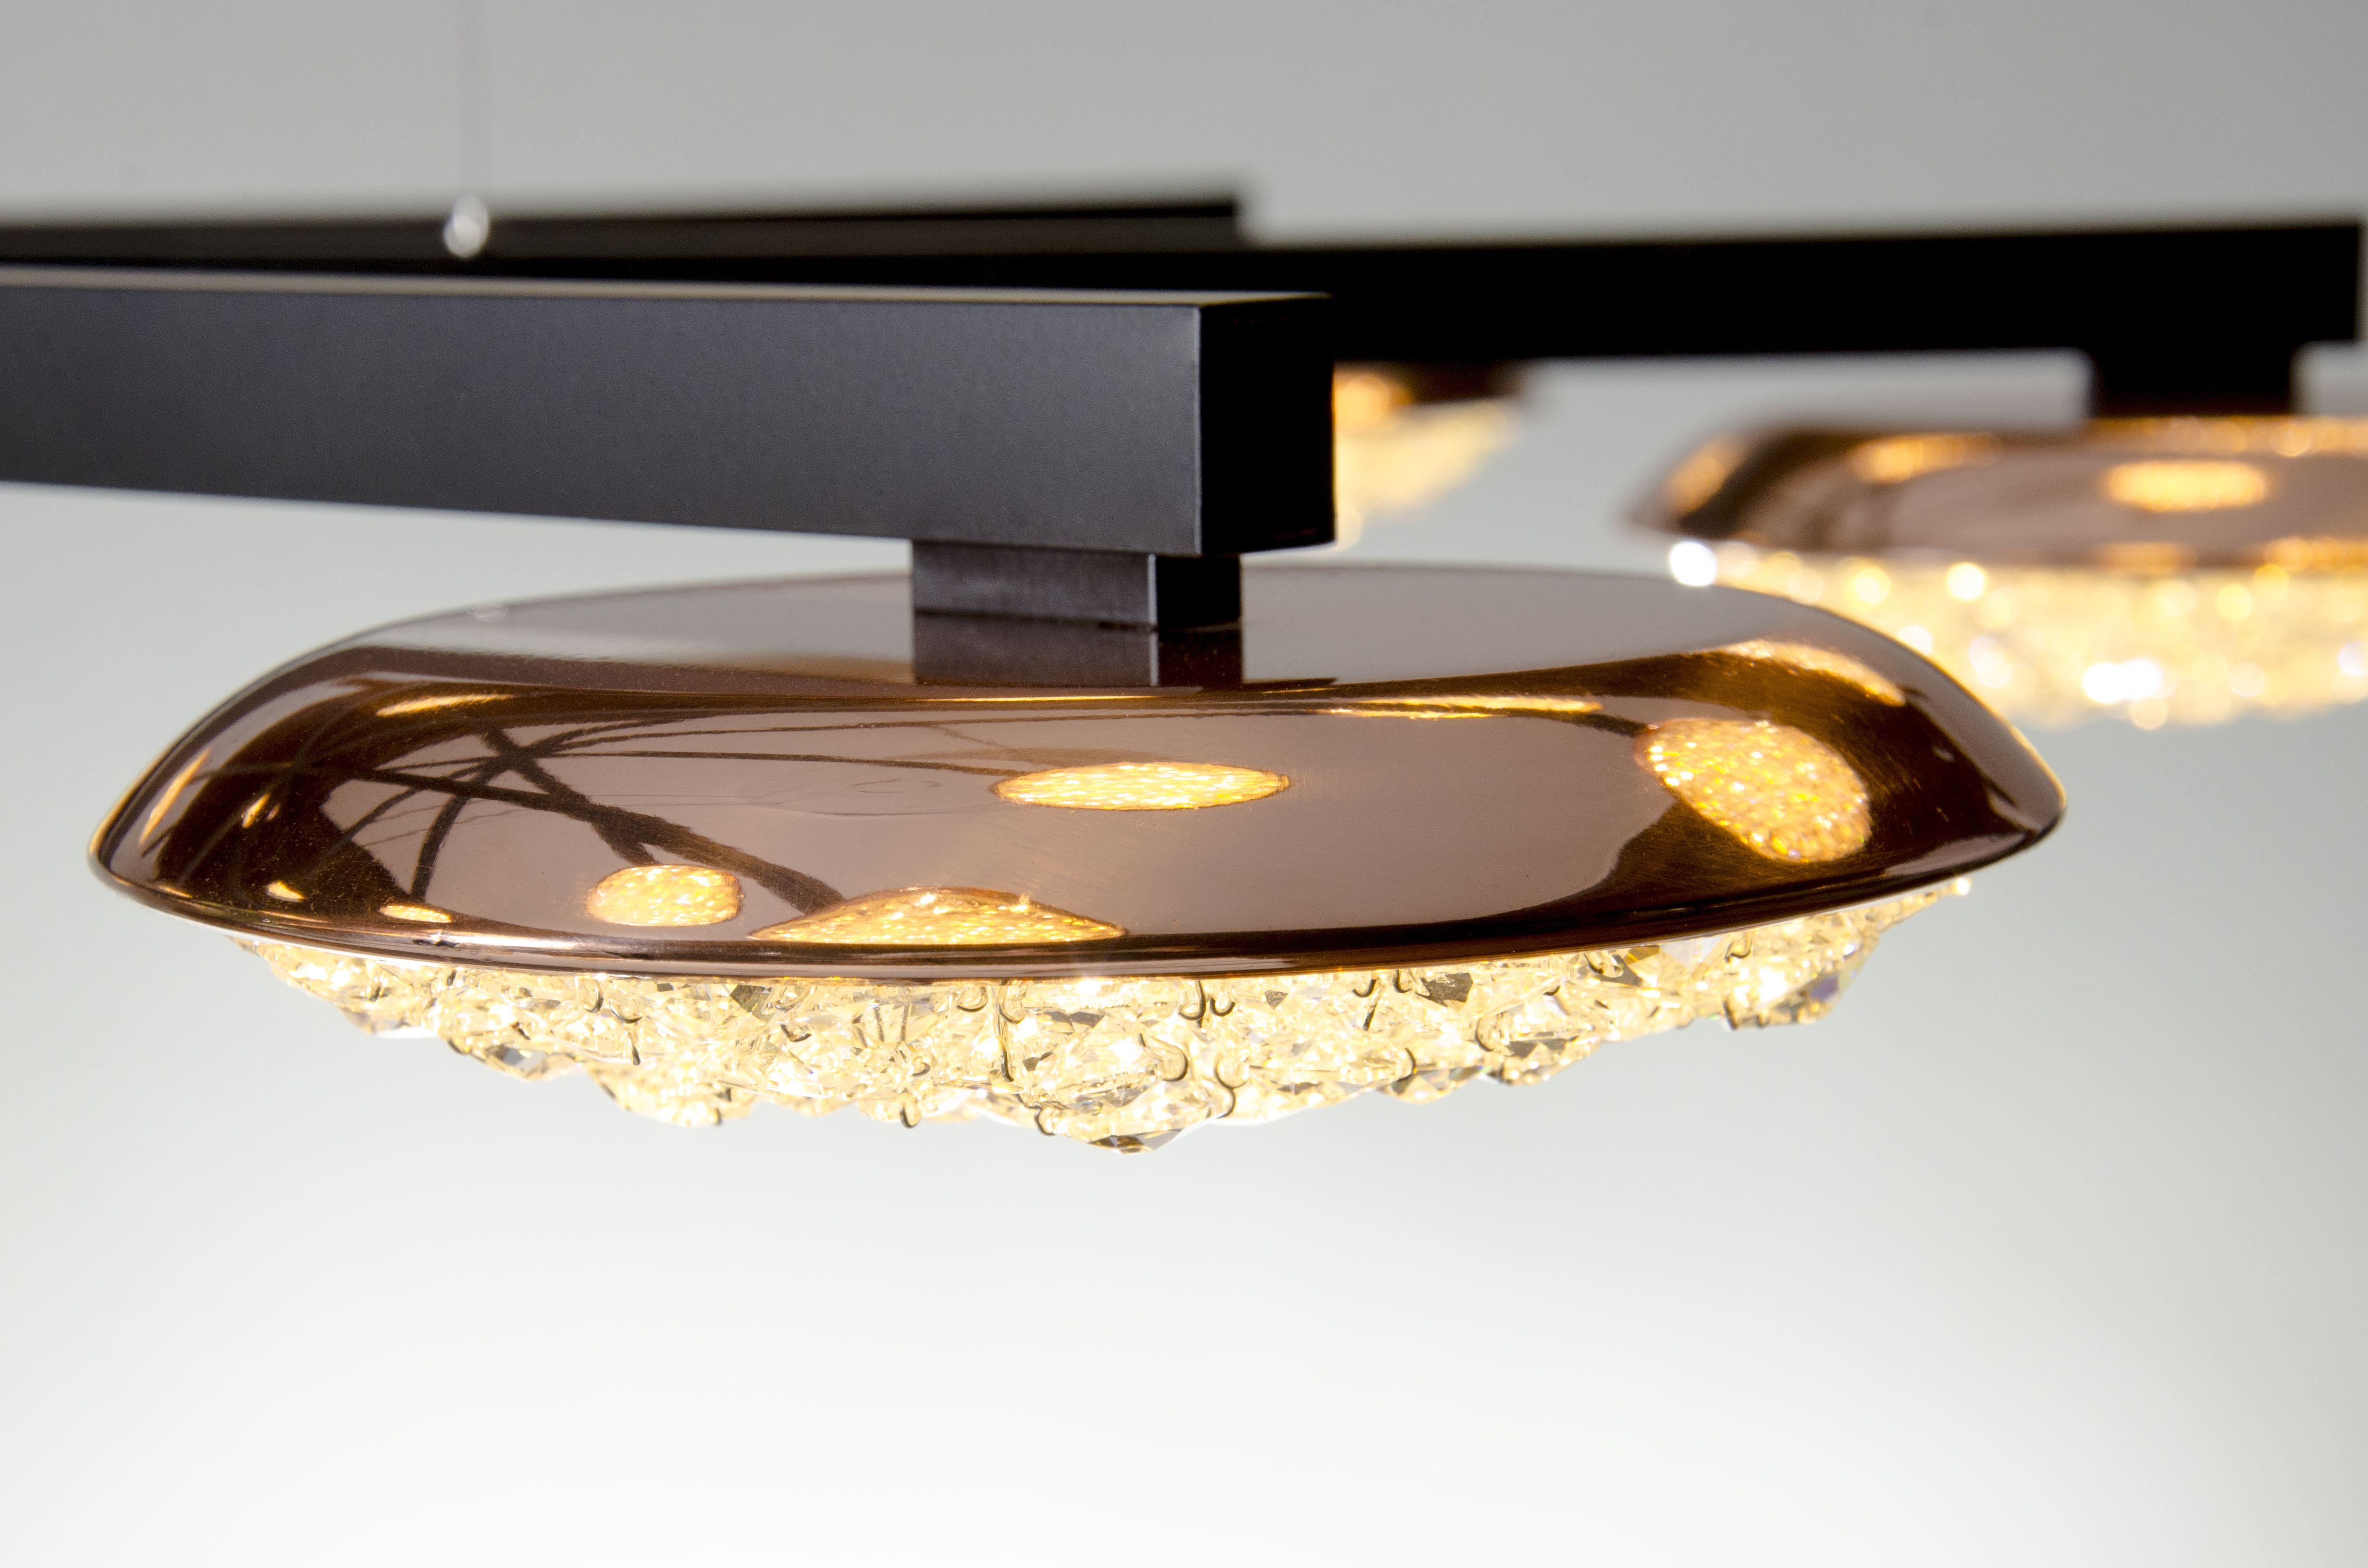 Origo Star Crystal Chandelier  www.manooi.com #Manooi #Chandelier #CrystalChandelier #Design #Lighting #OrigoStar #luxury #furniture #interior #homedecor #LED #Swarovski